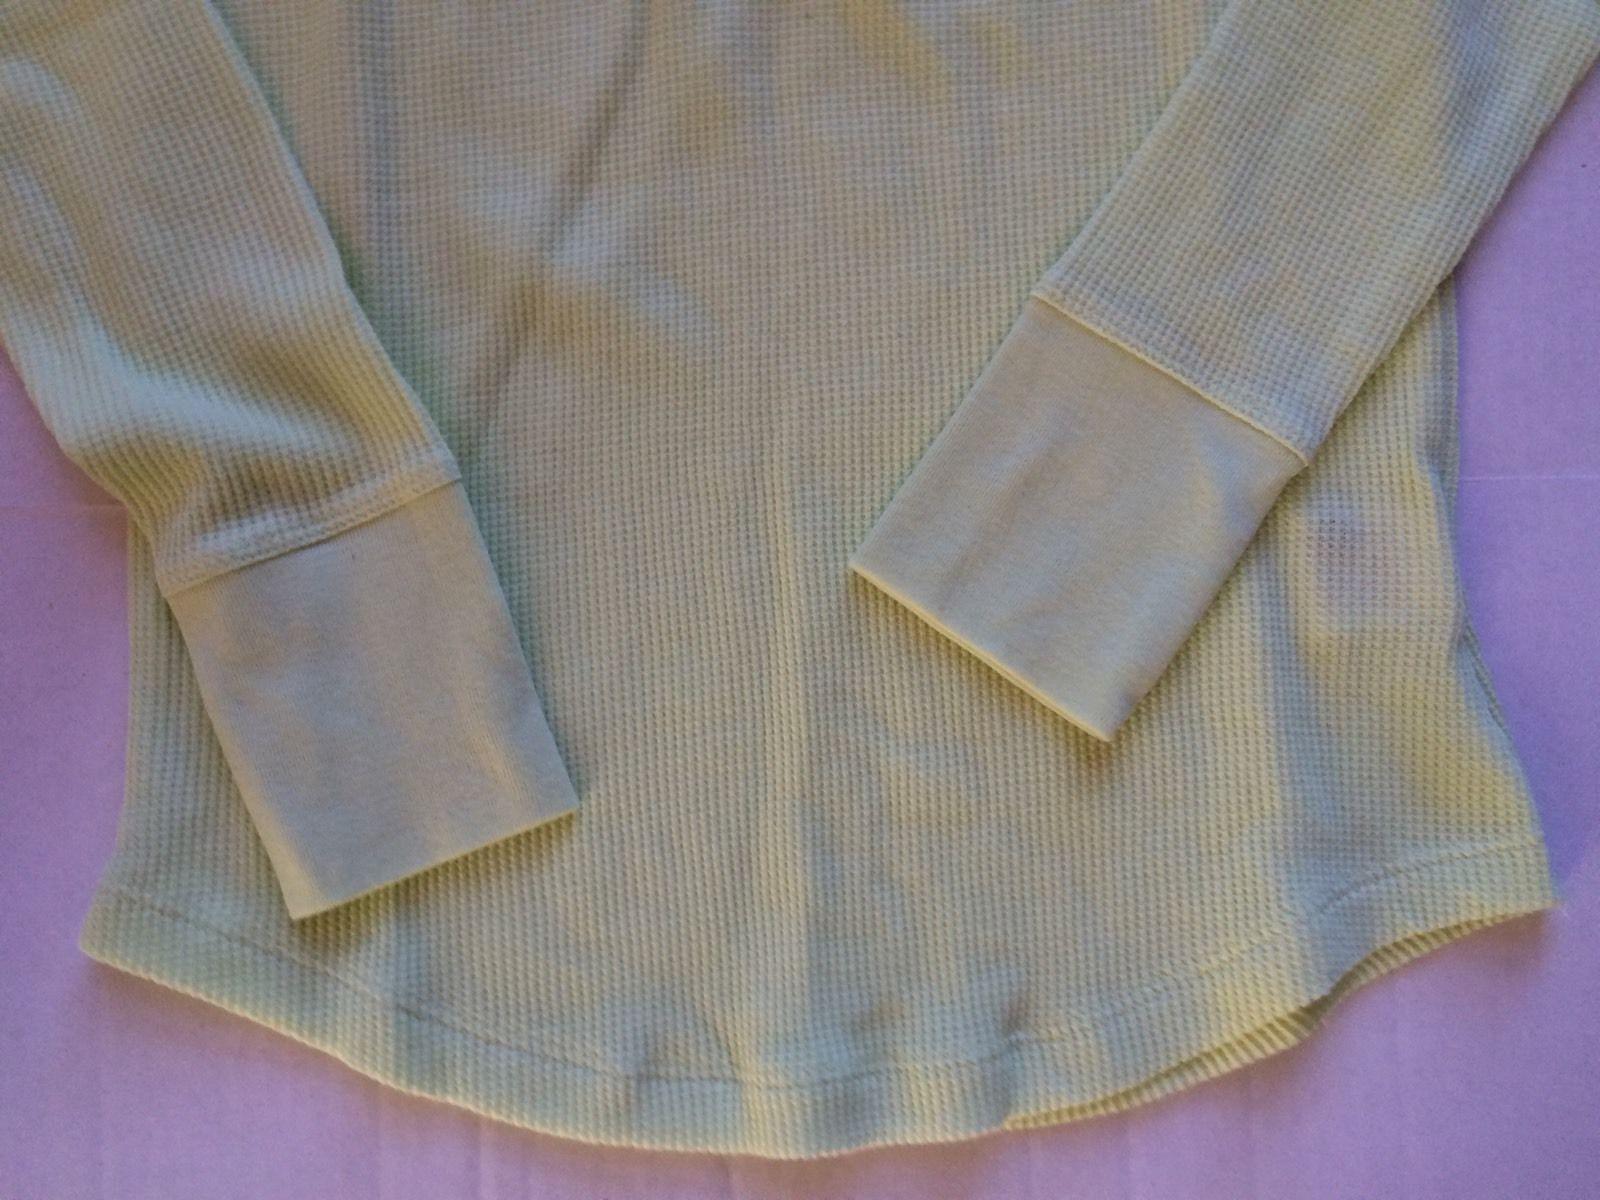 FADED GLORY Henley t.shirt size Small 4-6 Lemon